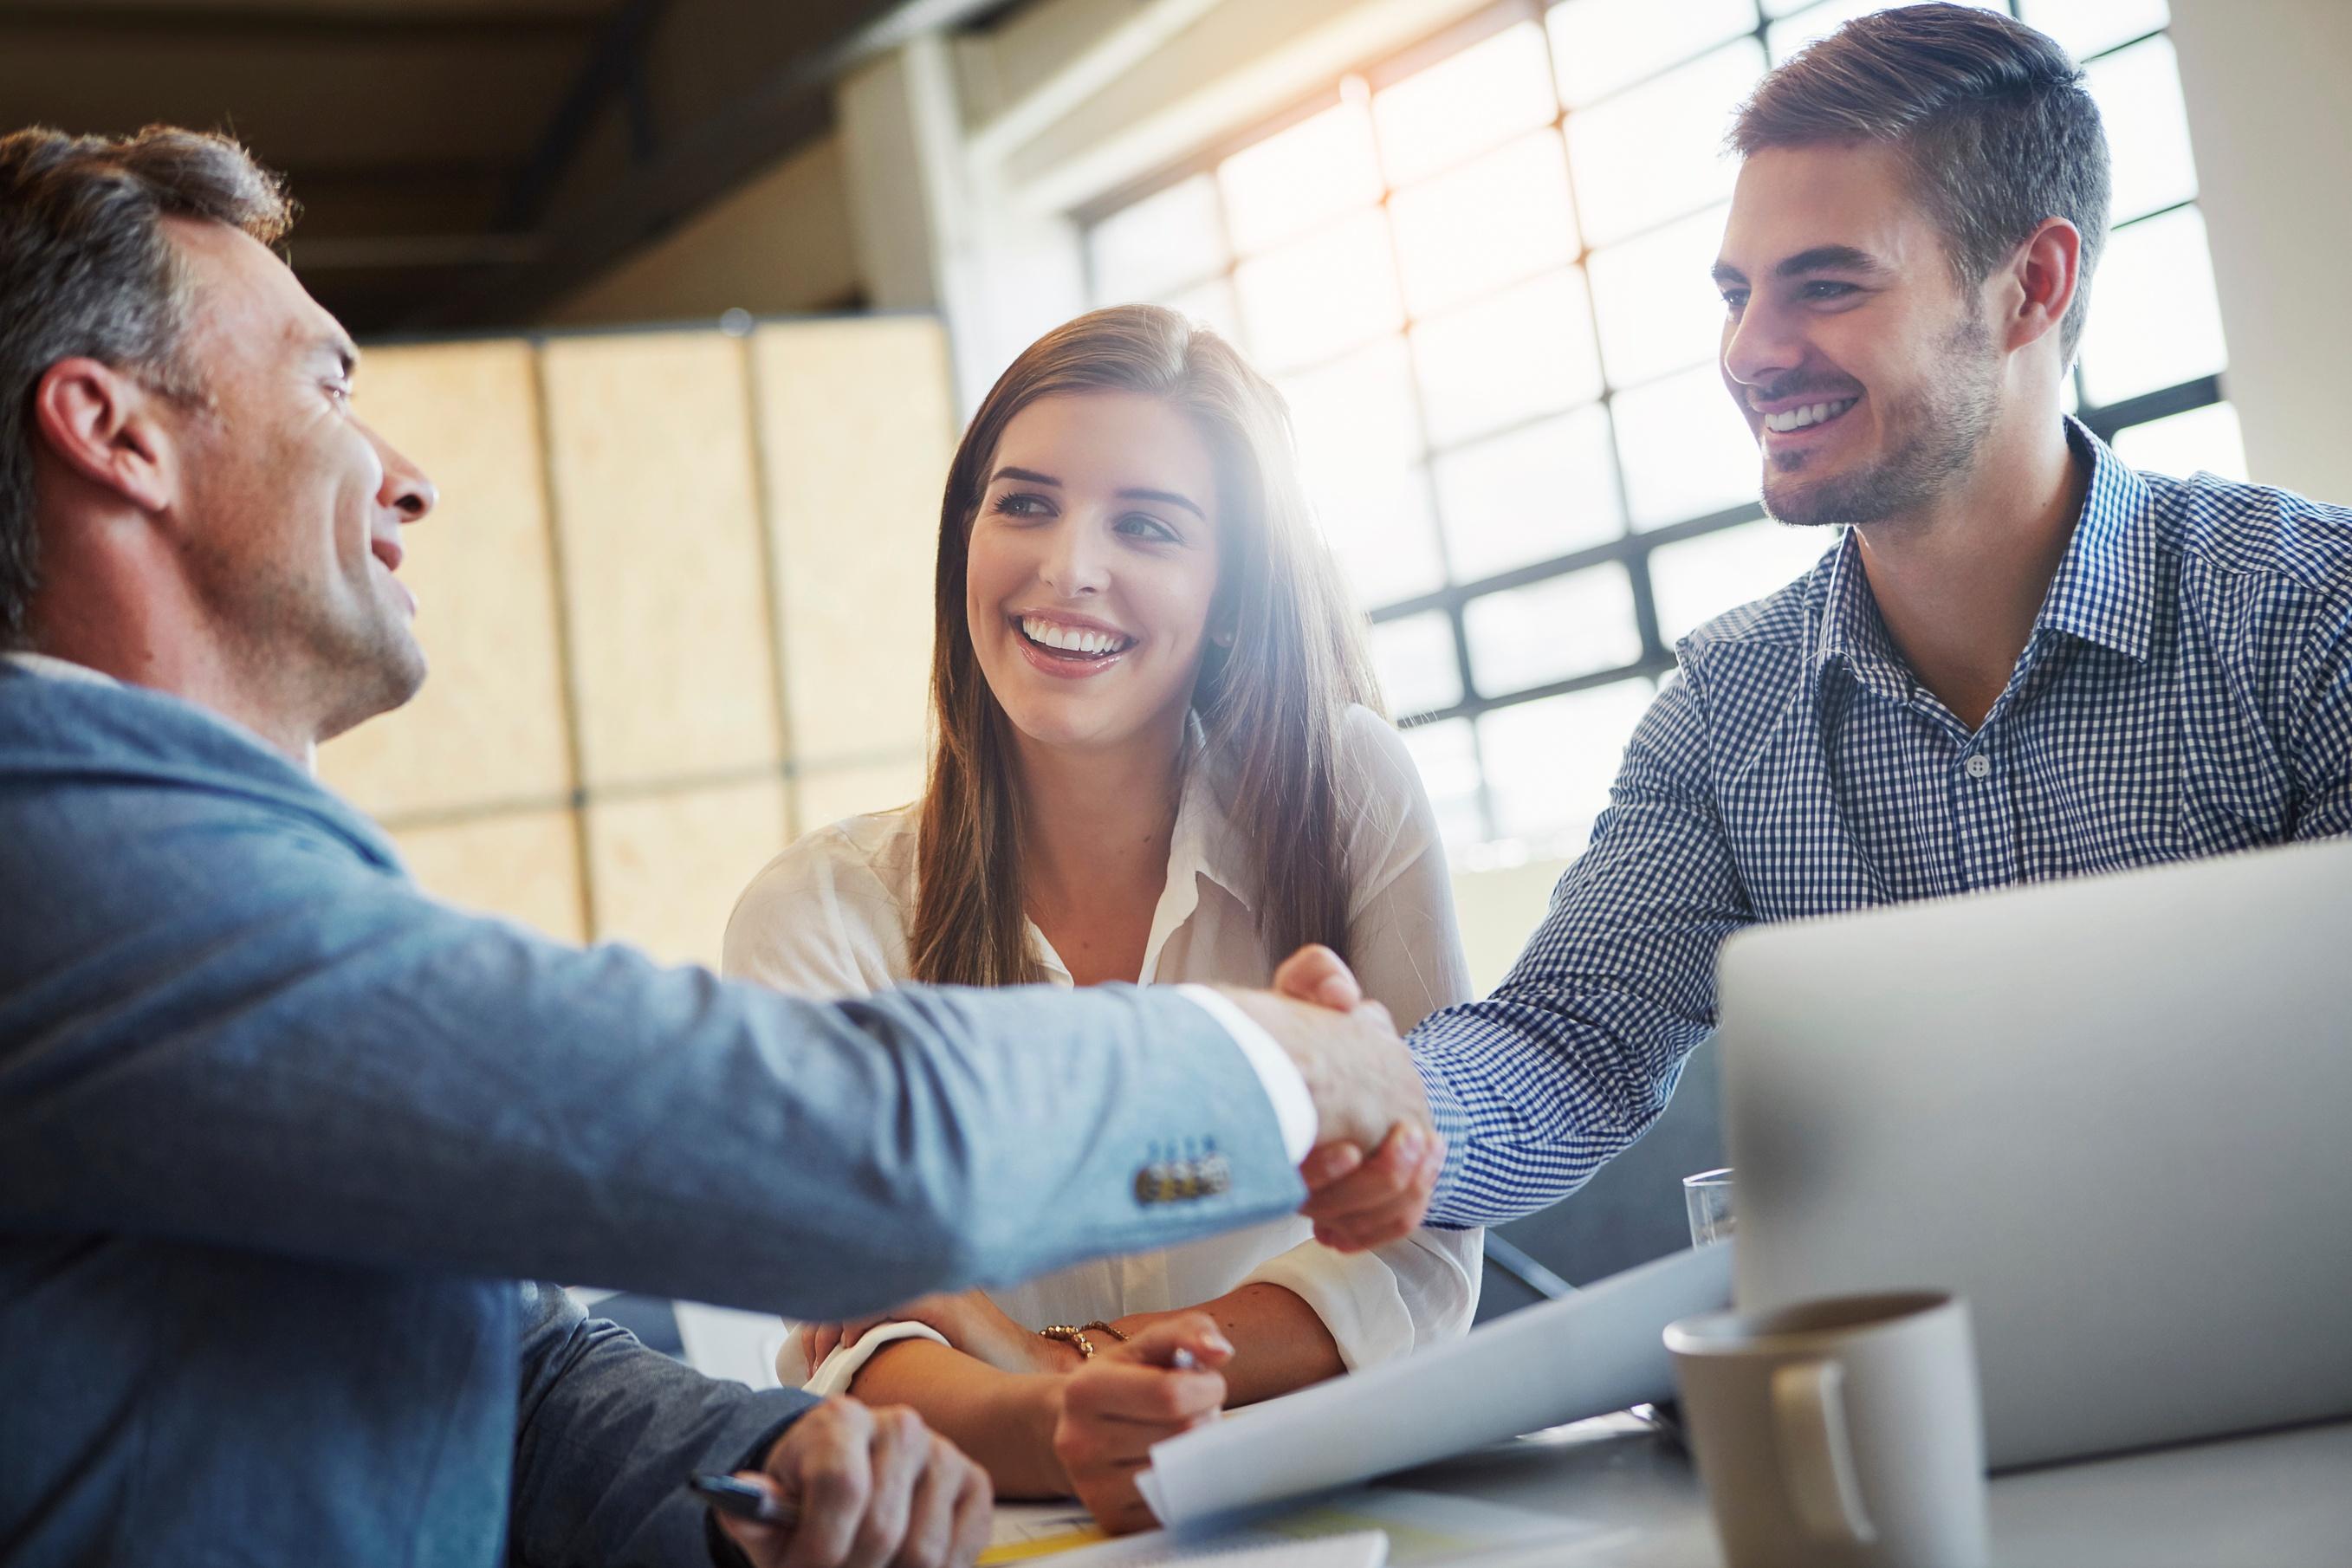 nextgen clients for advisors